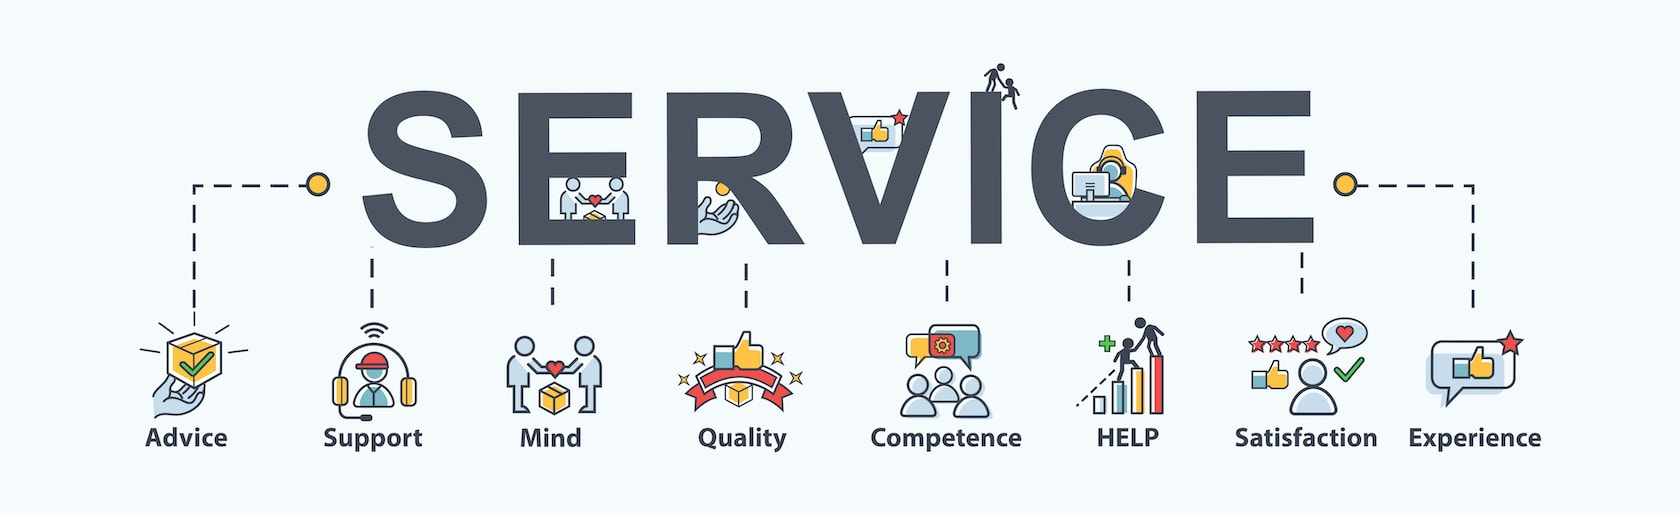 MageExchange Services